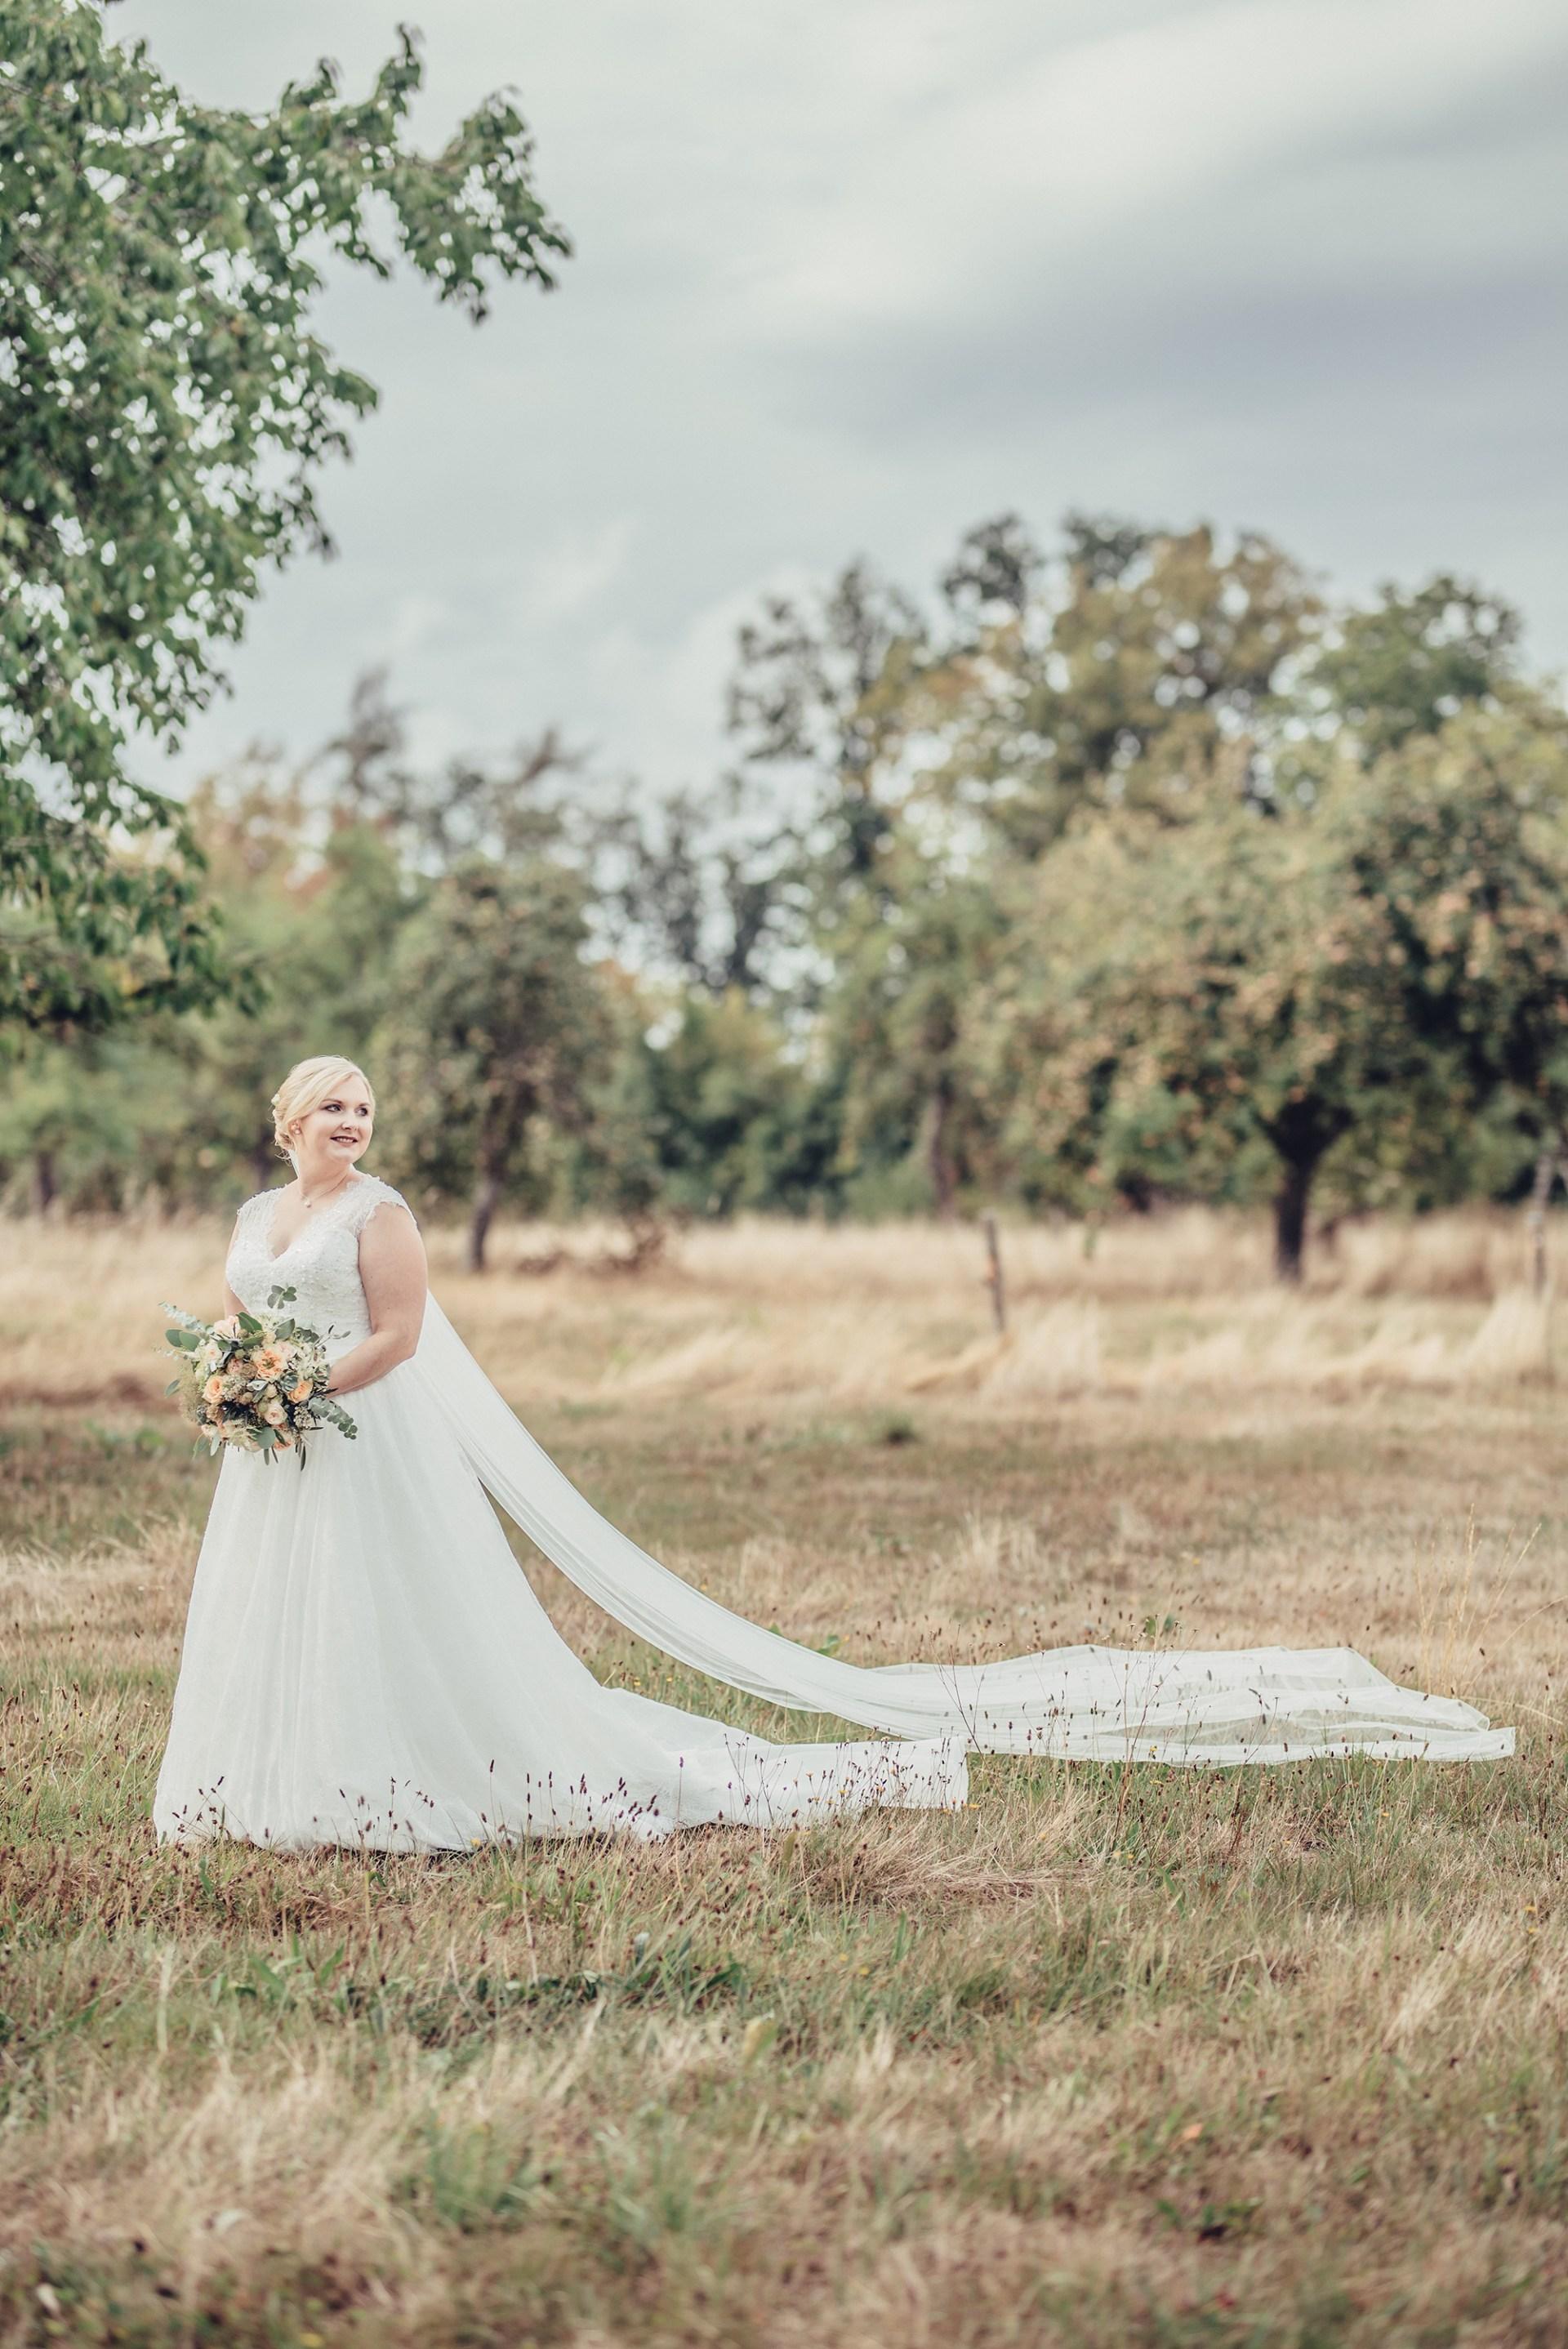 weddingseptemberluminoxx92348234192